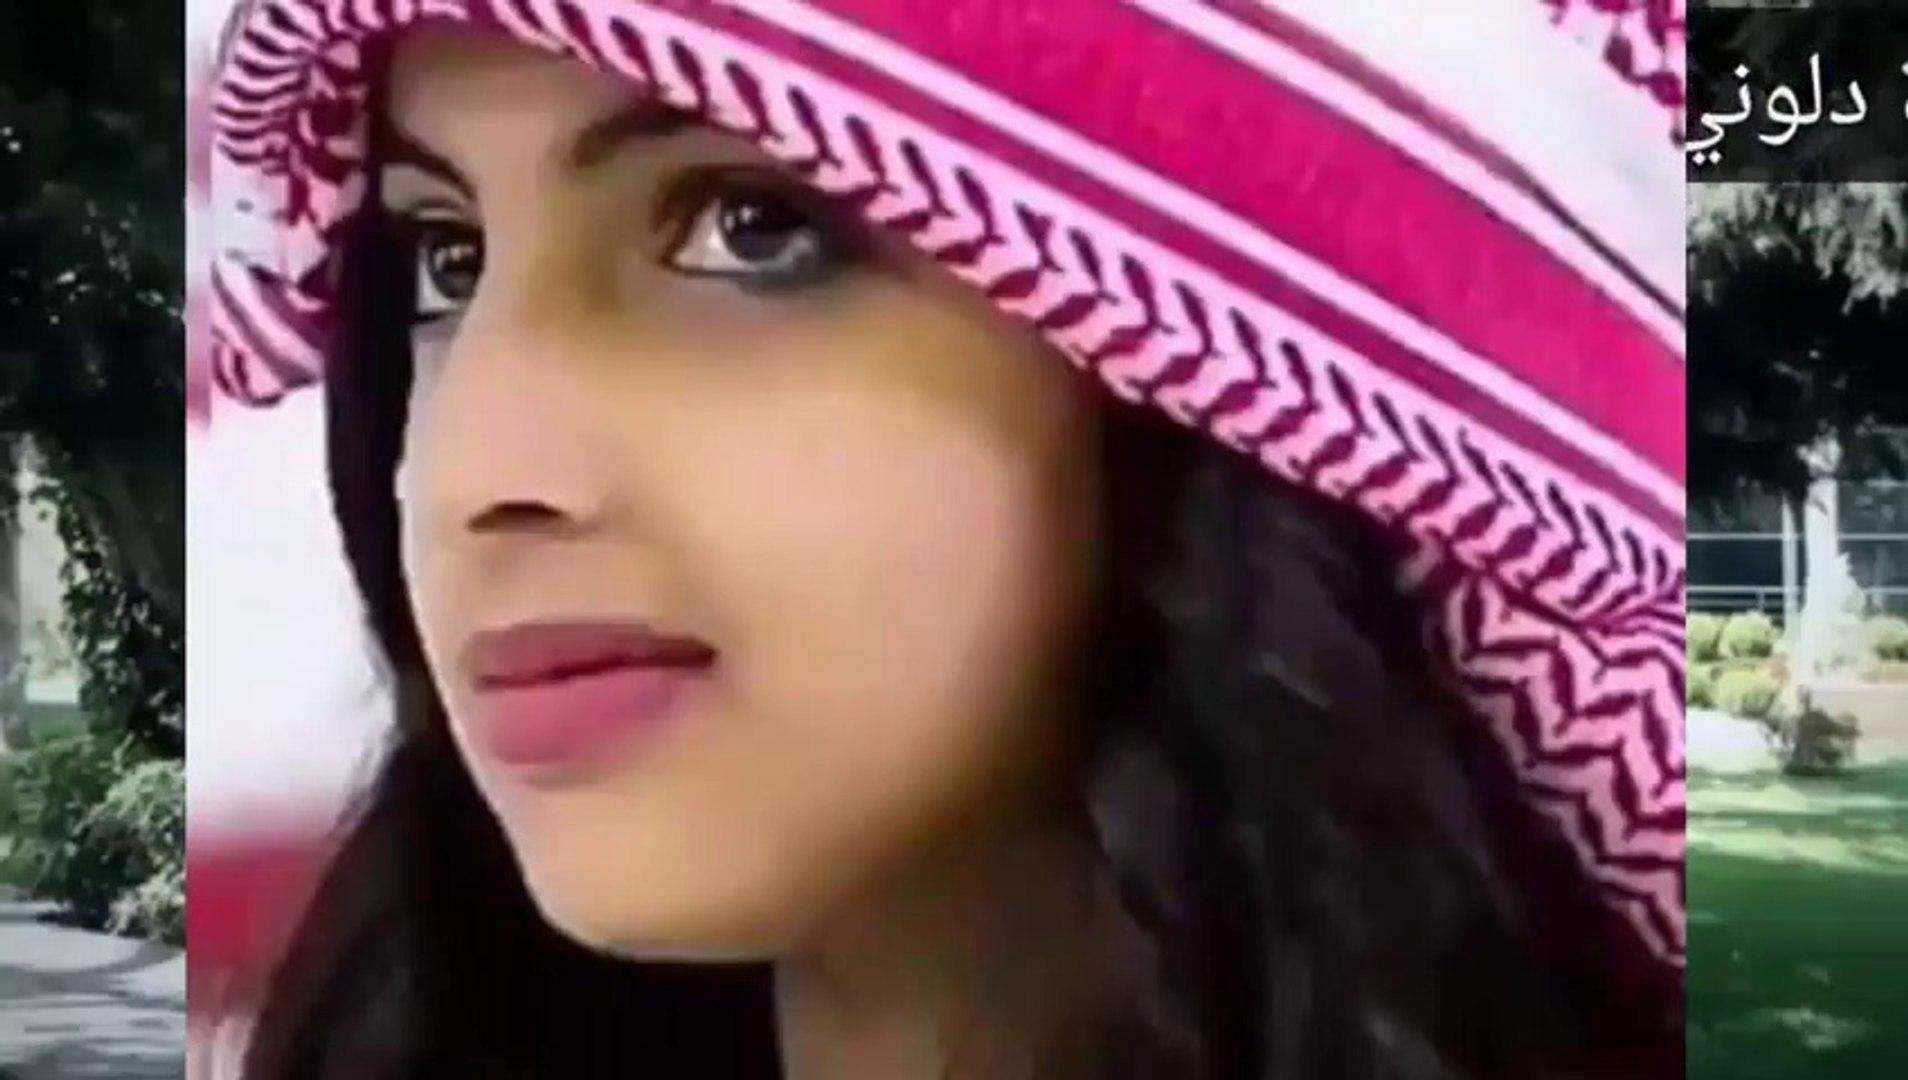 رقص بنات جميلات شيله سعوديه 2019